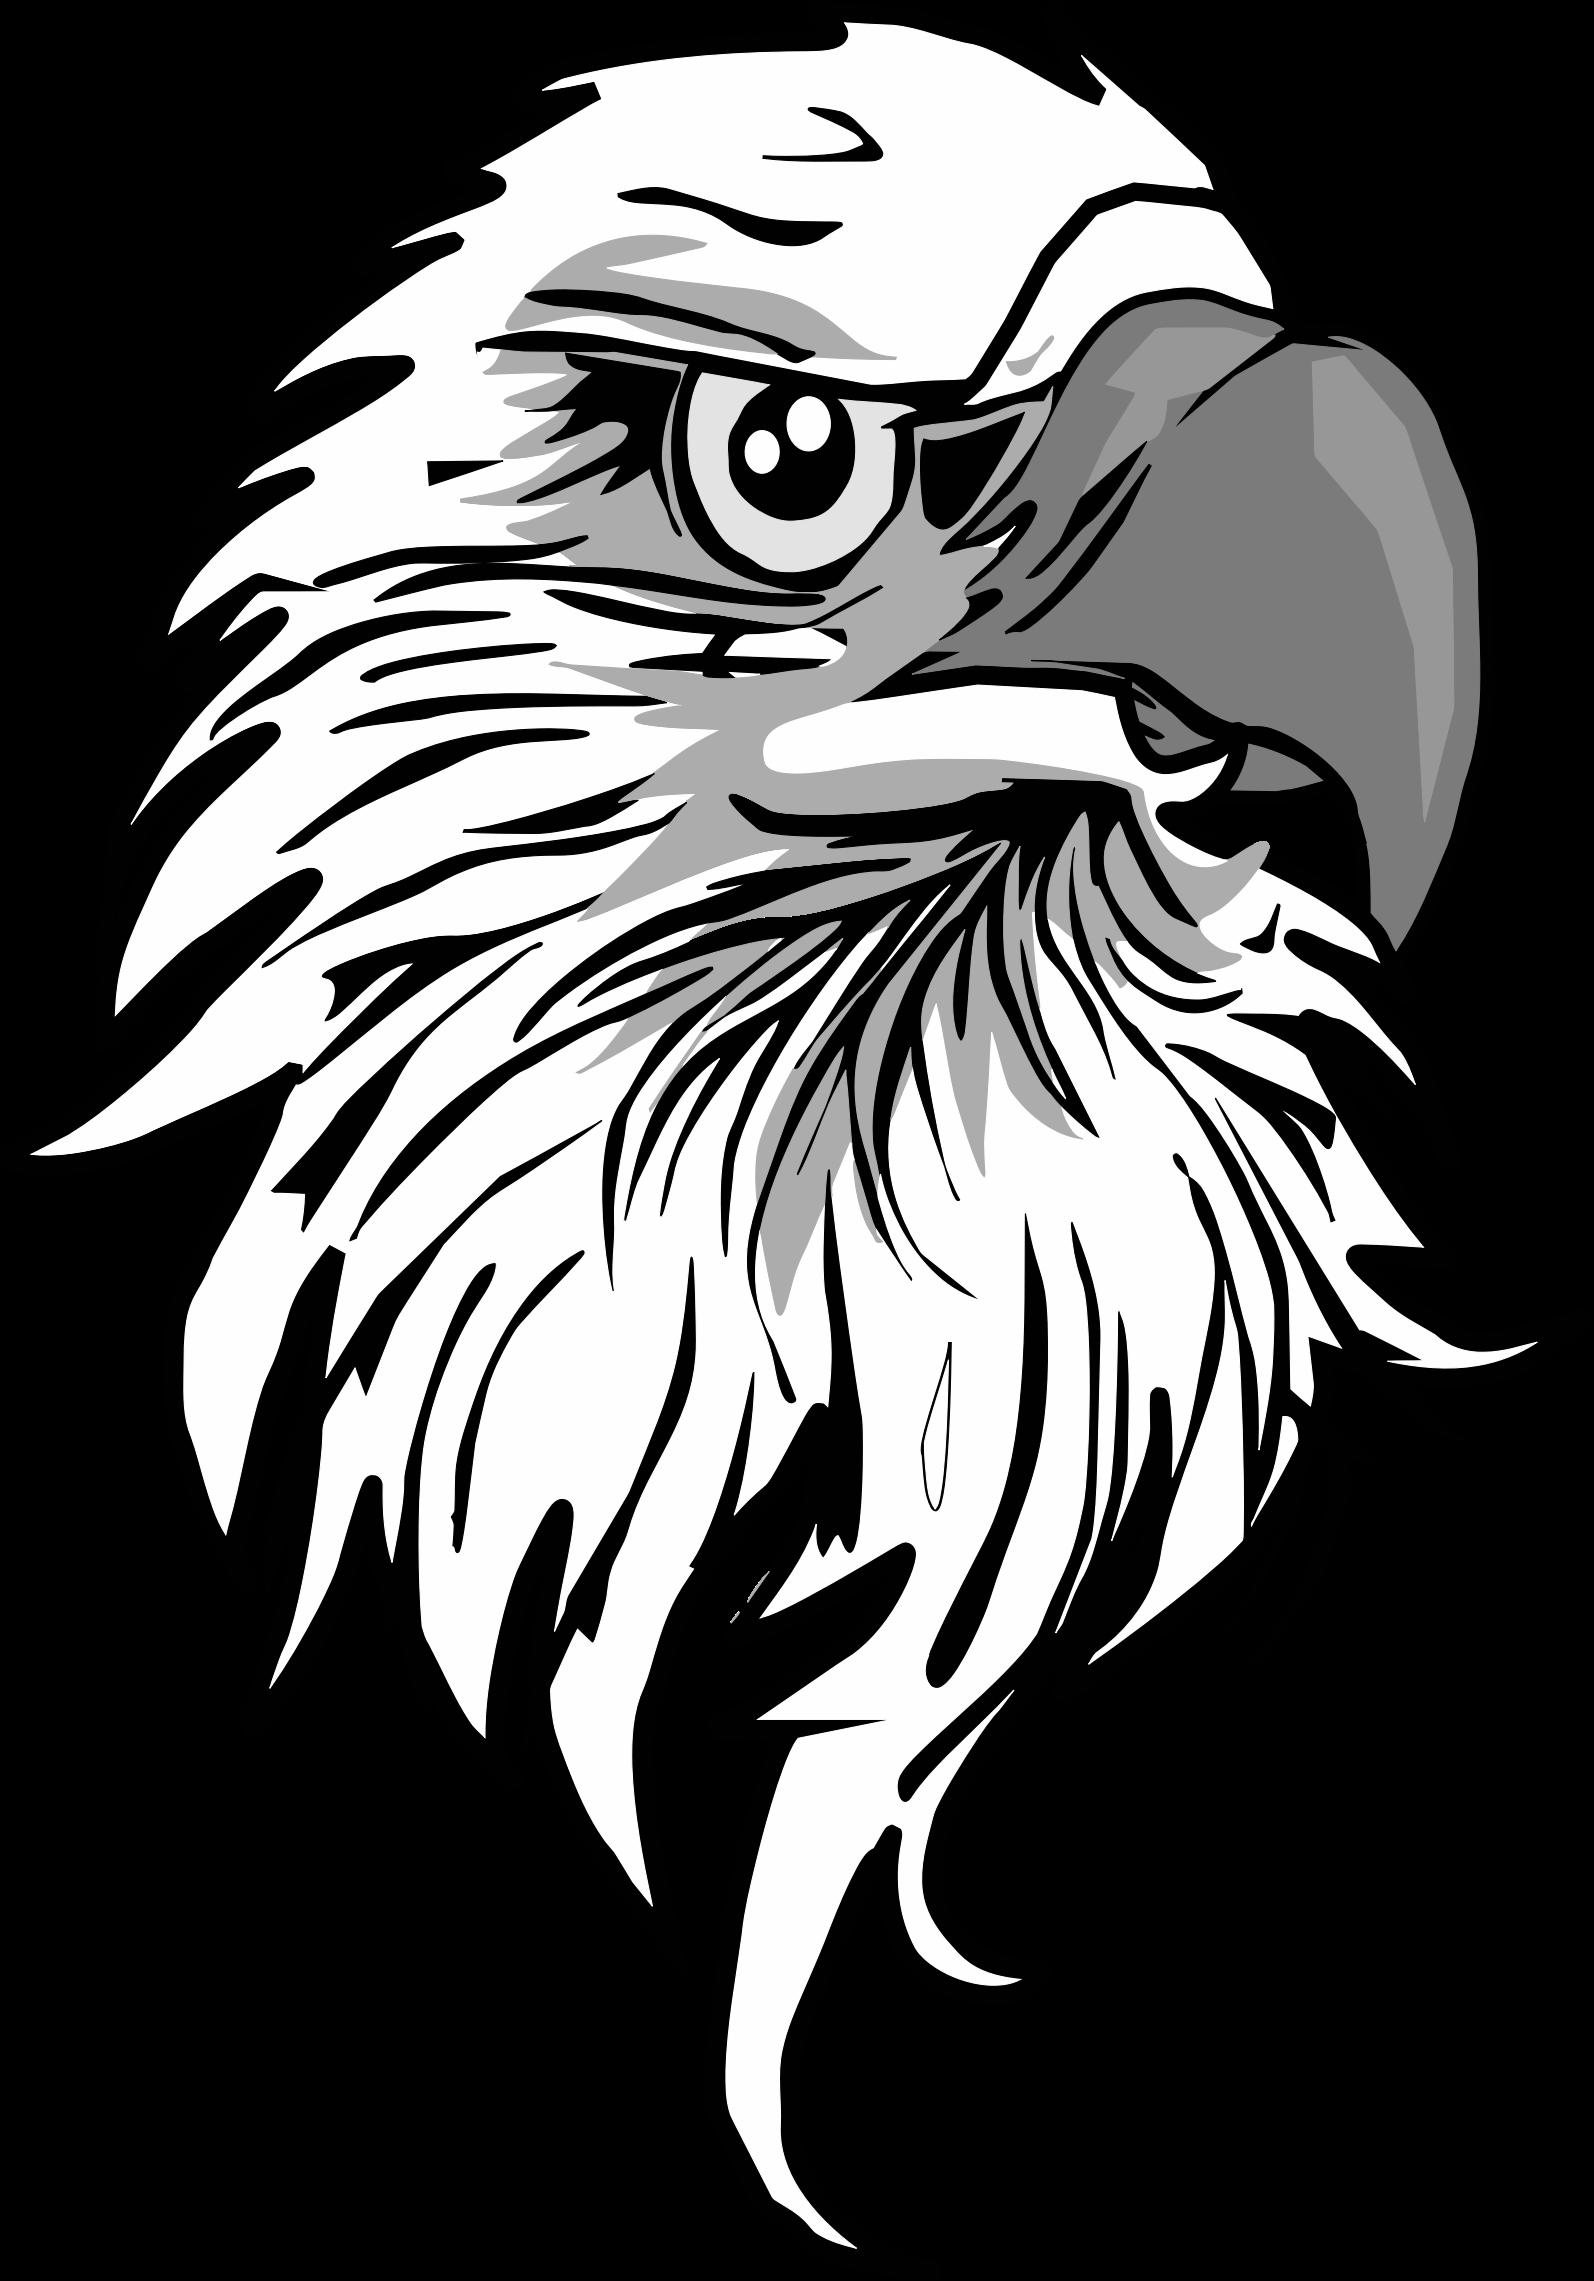 Page of clipartblack com. Eagles clipart eagle head